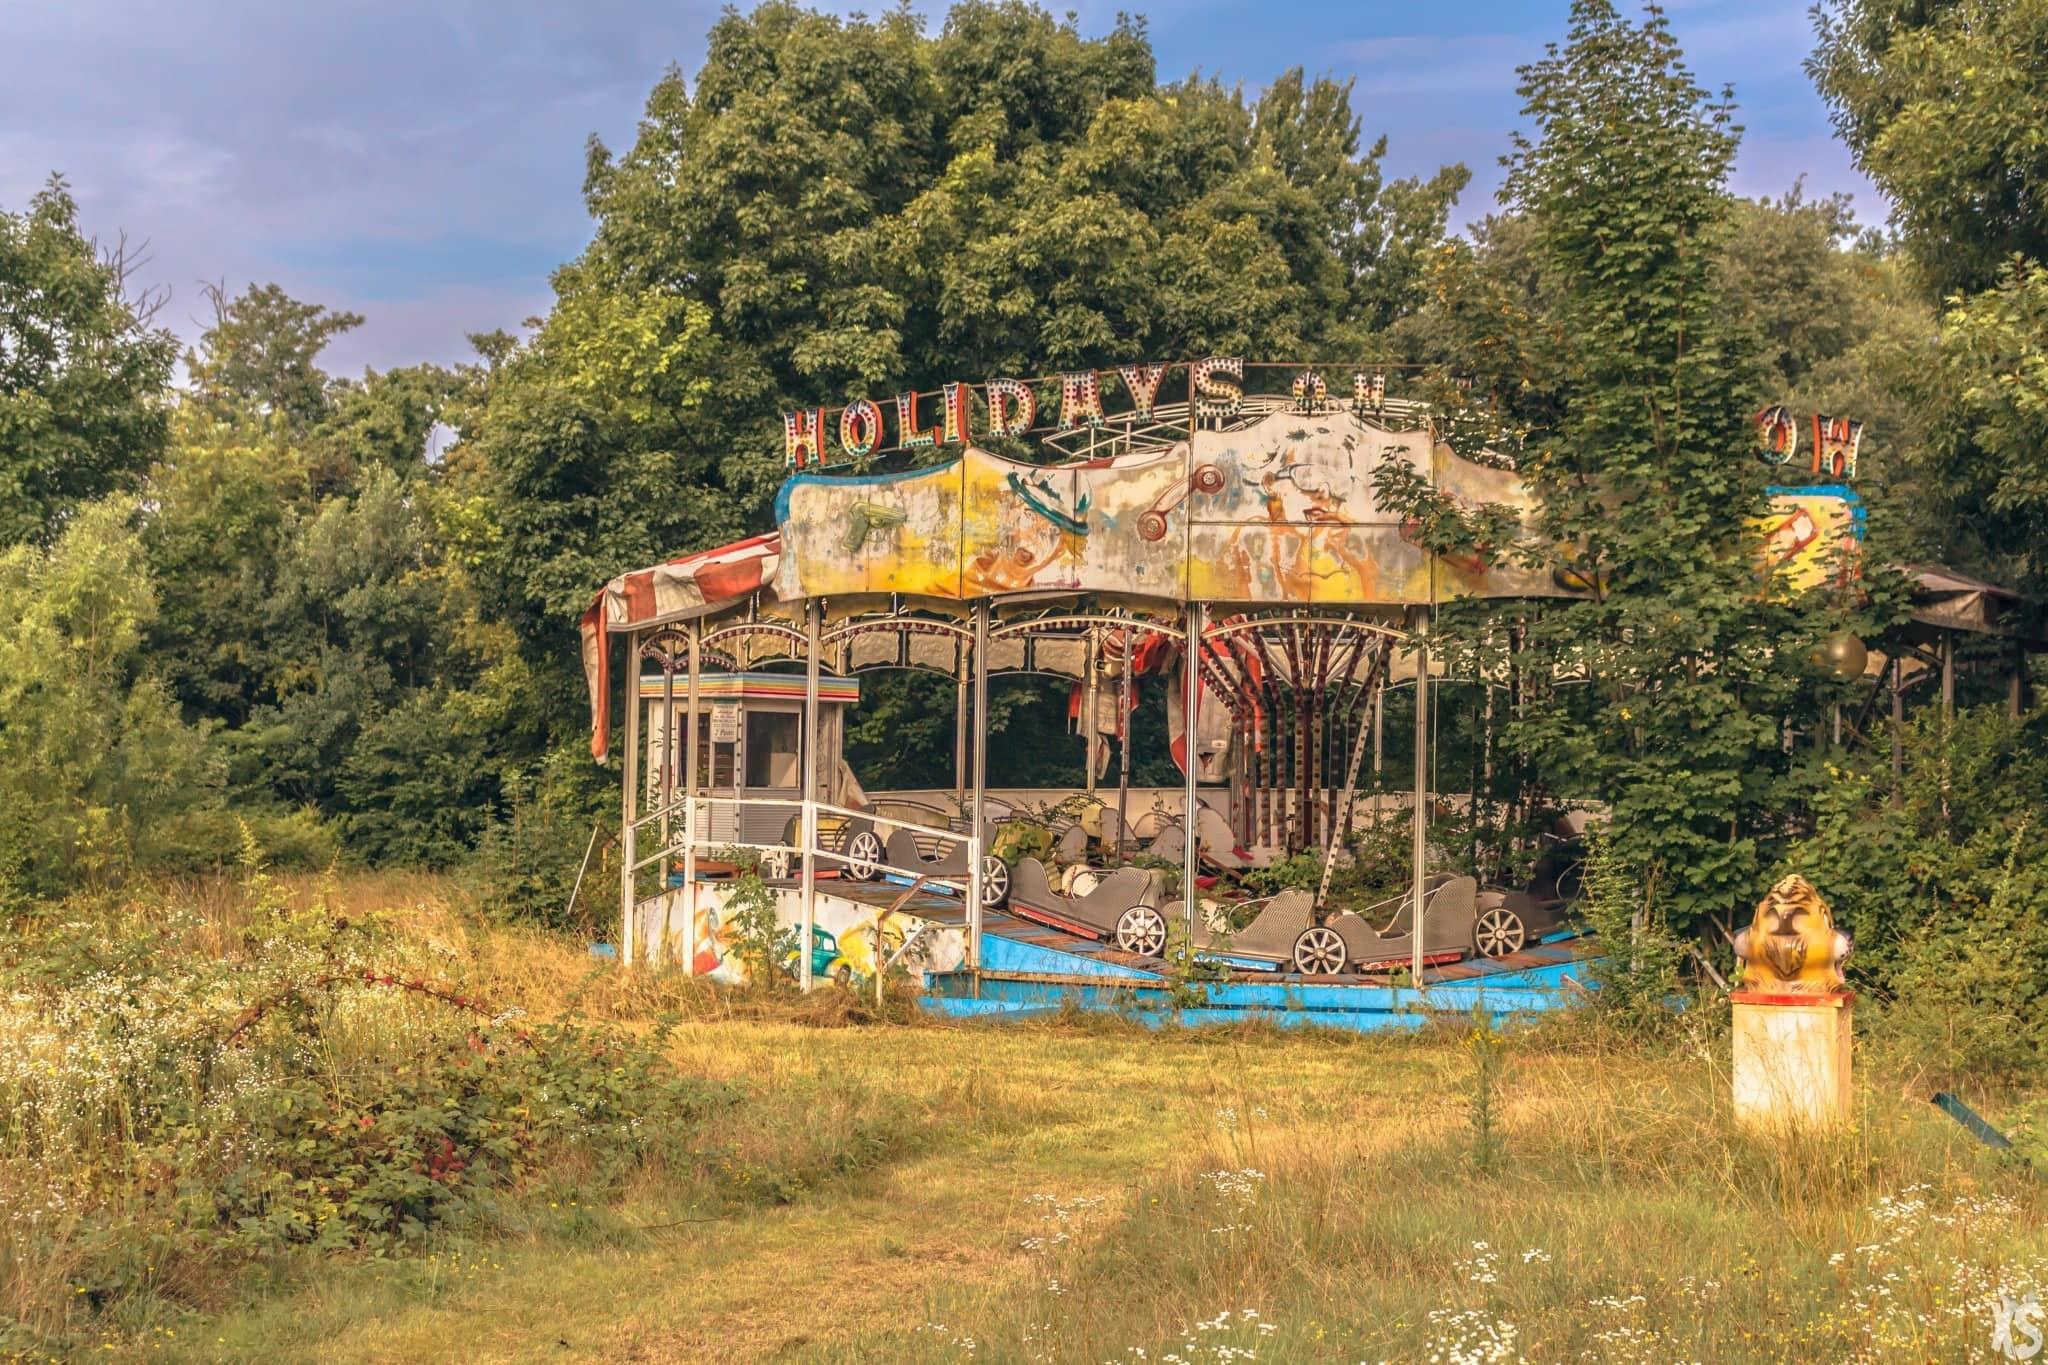 Parque de Atracciones Abandonado en Italia | urbexsession.com/es/beaver-land-parque-de-atracciones-abandonado-italia | Urbex Italia